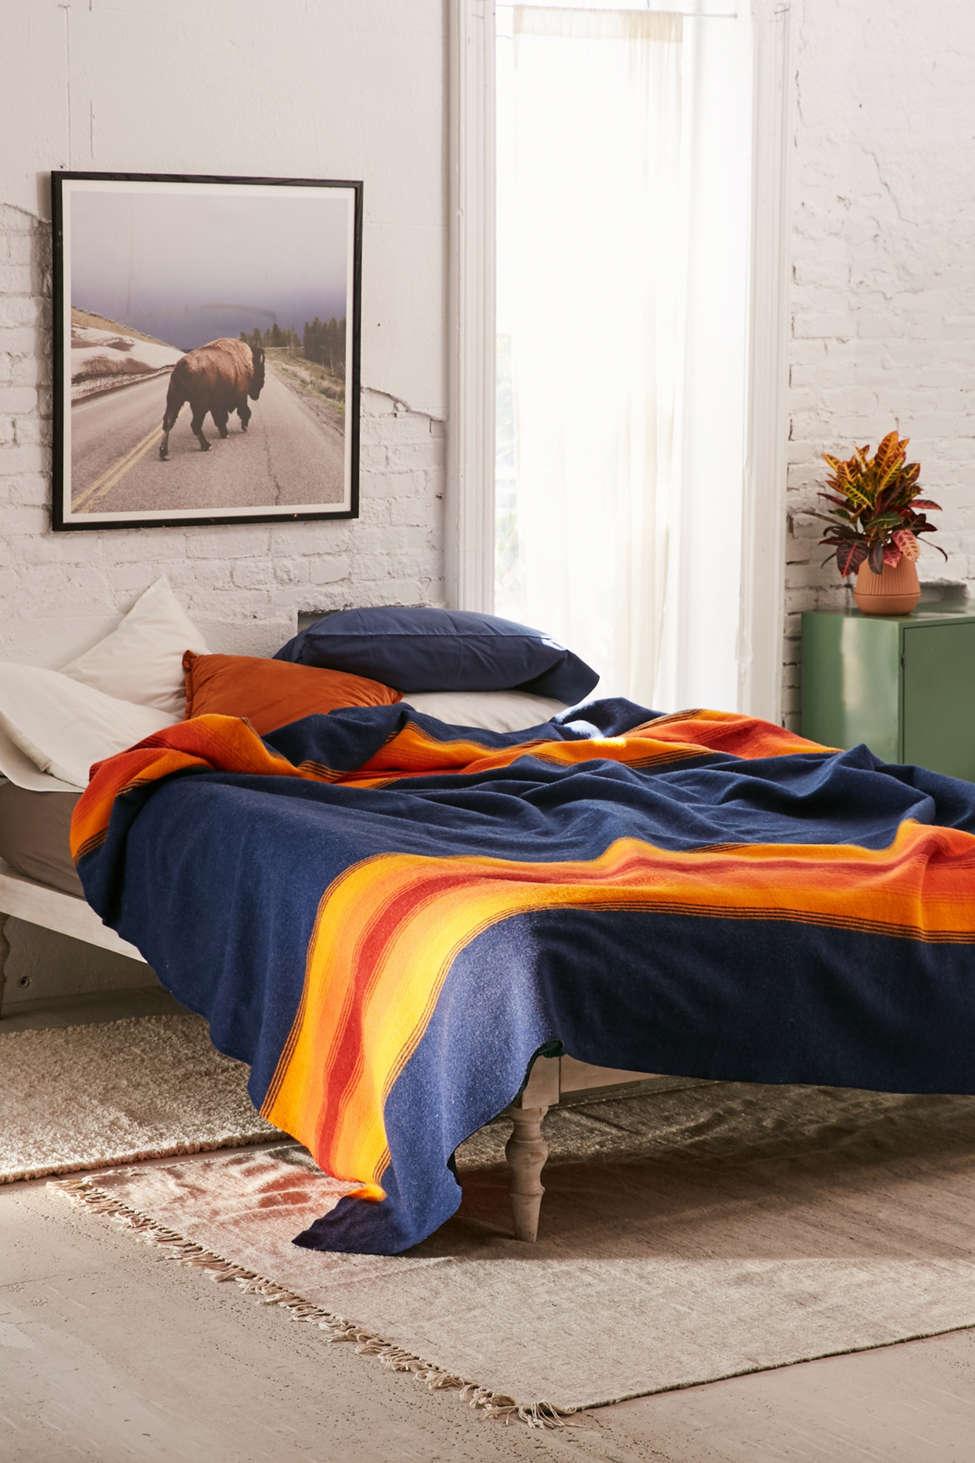 Slide View: 1: Pendleton Grand Canyon Bed Blanket